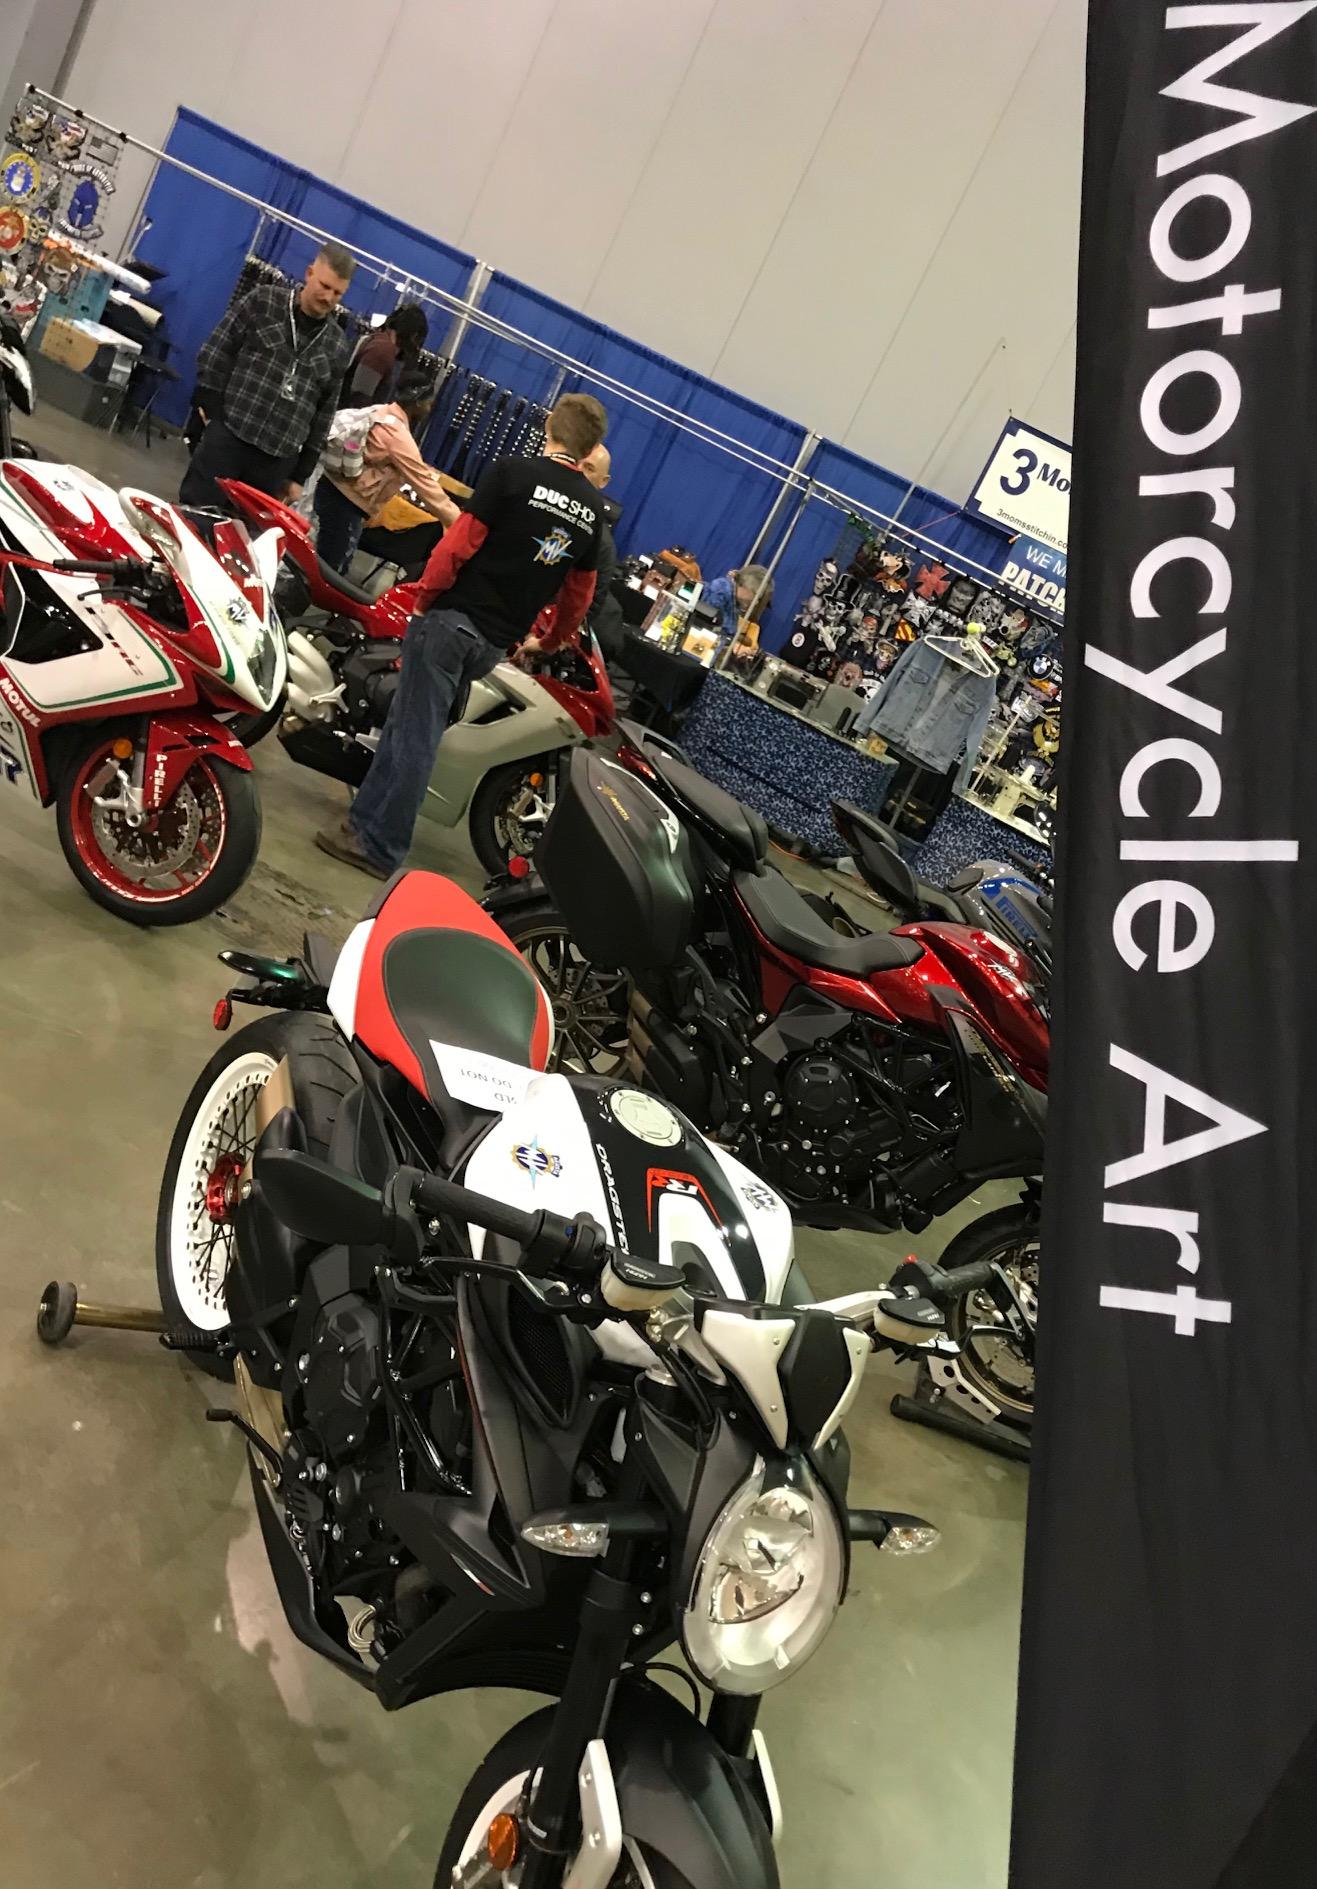 MotorcycleShow_36